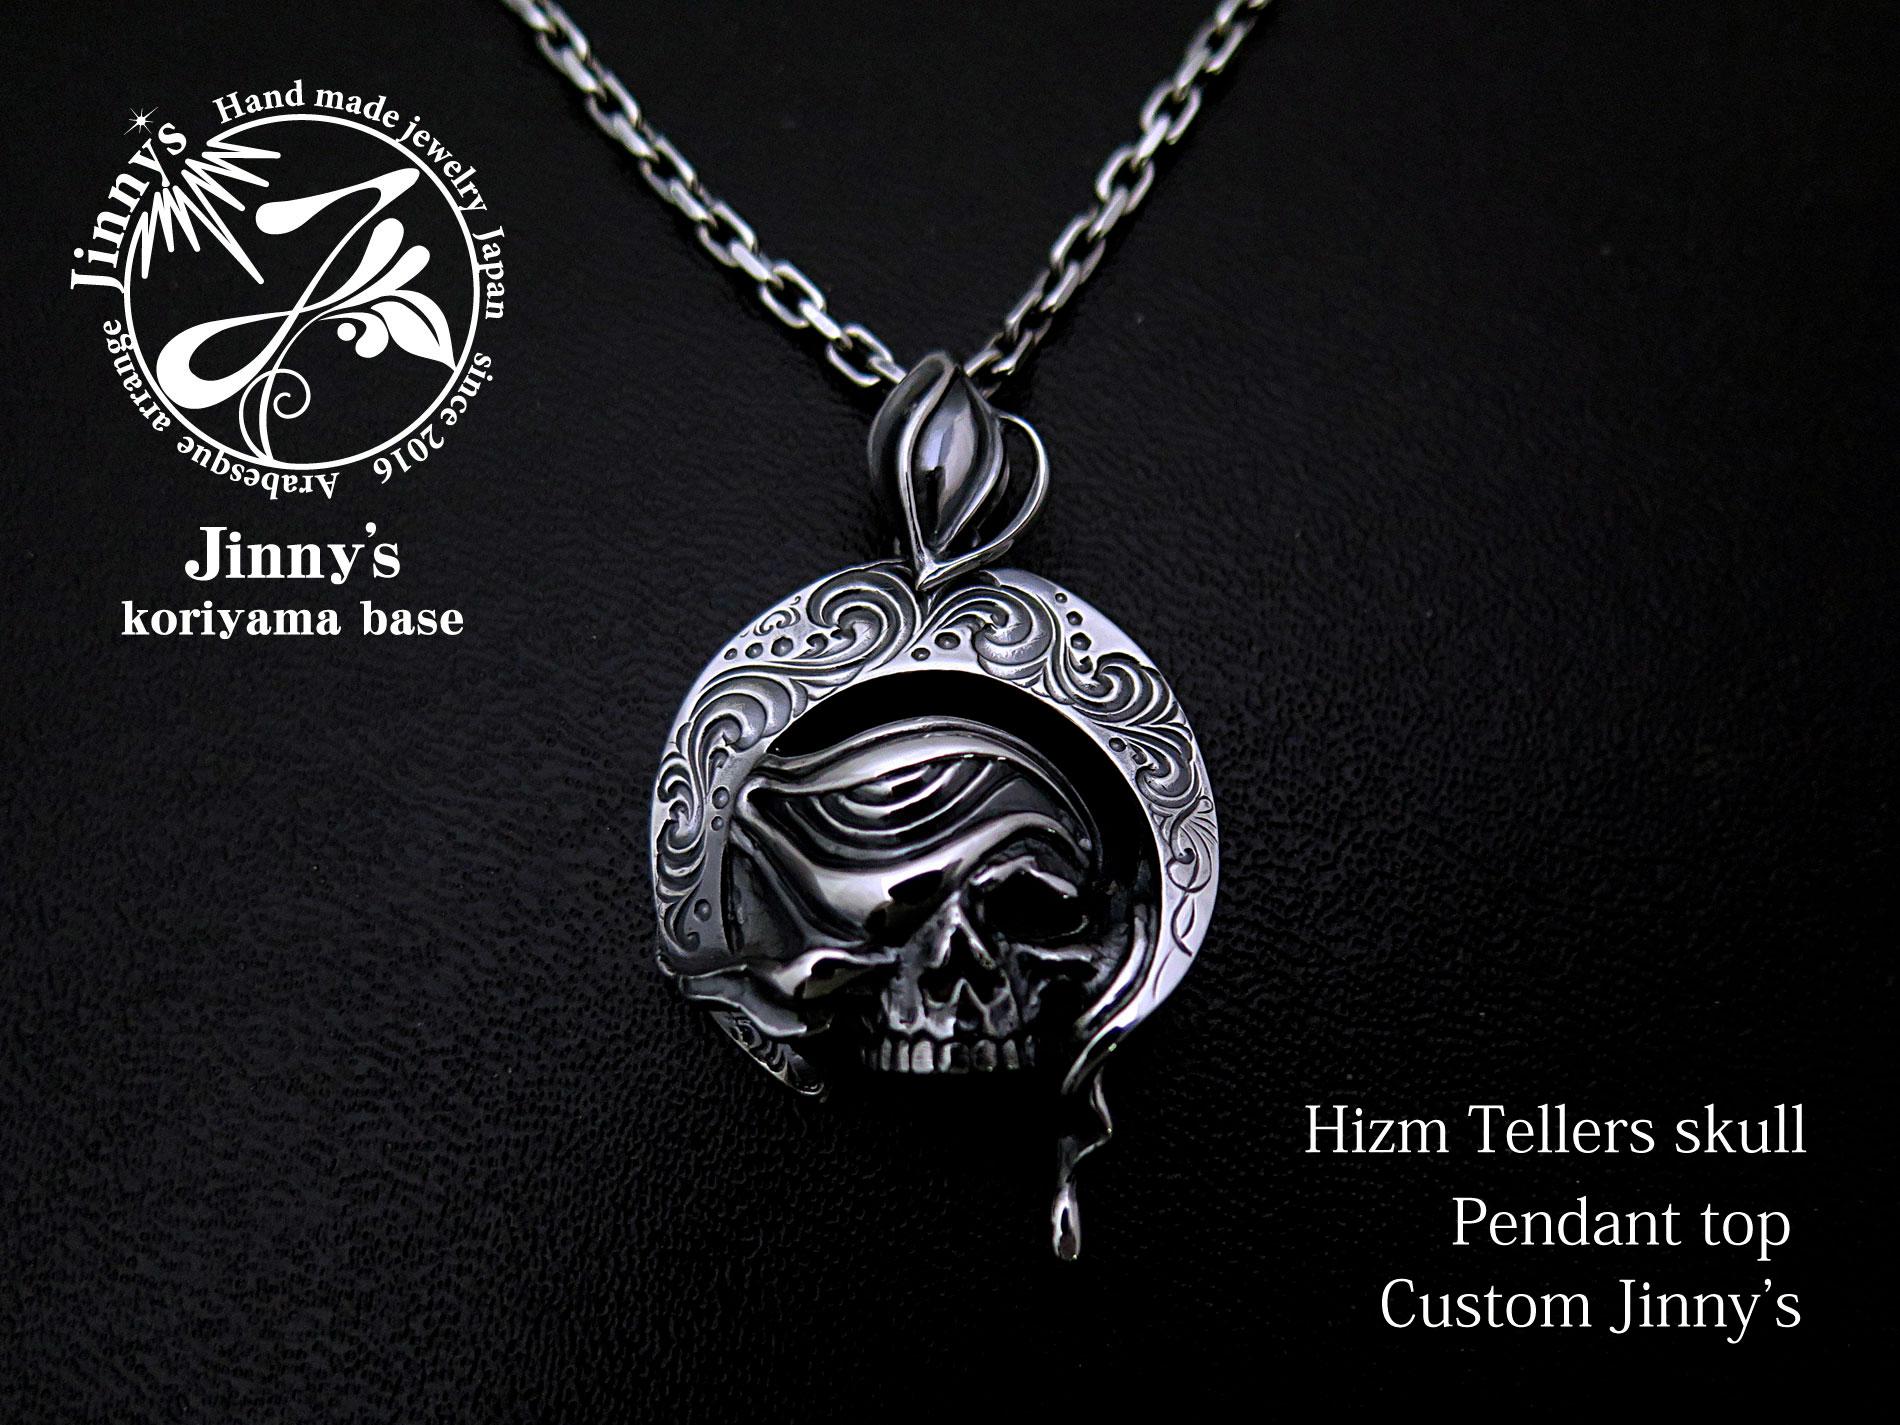 5 jinnys hizm tellers skull pendant top custom jinnys mozeypictures Images